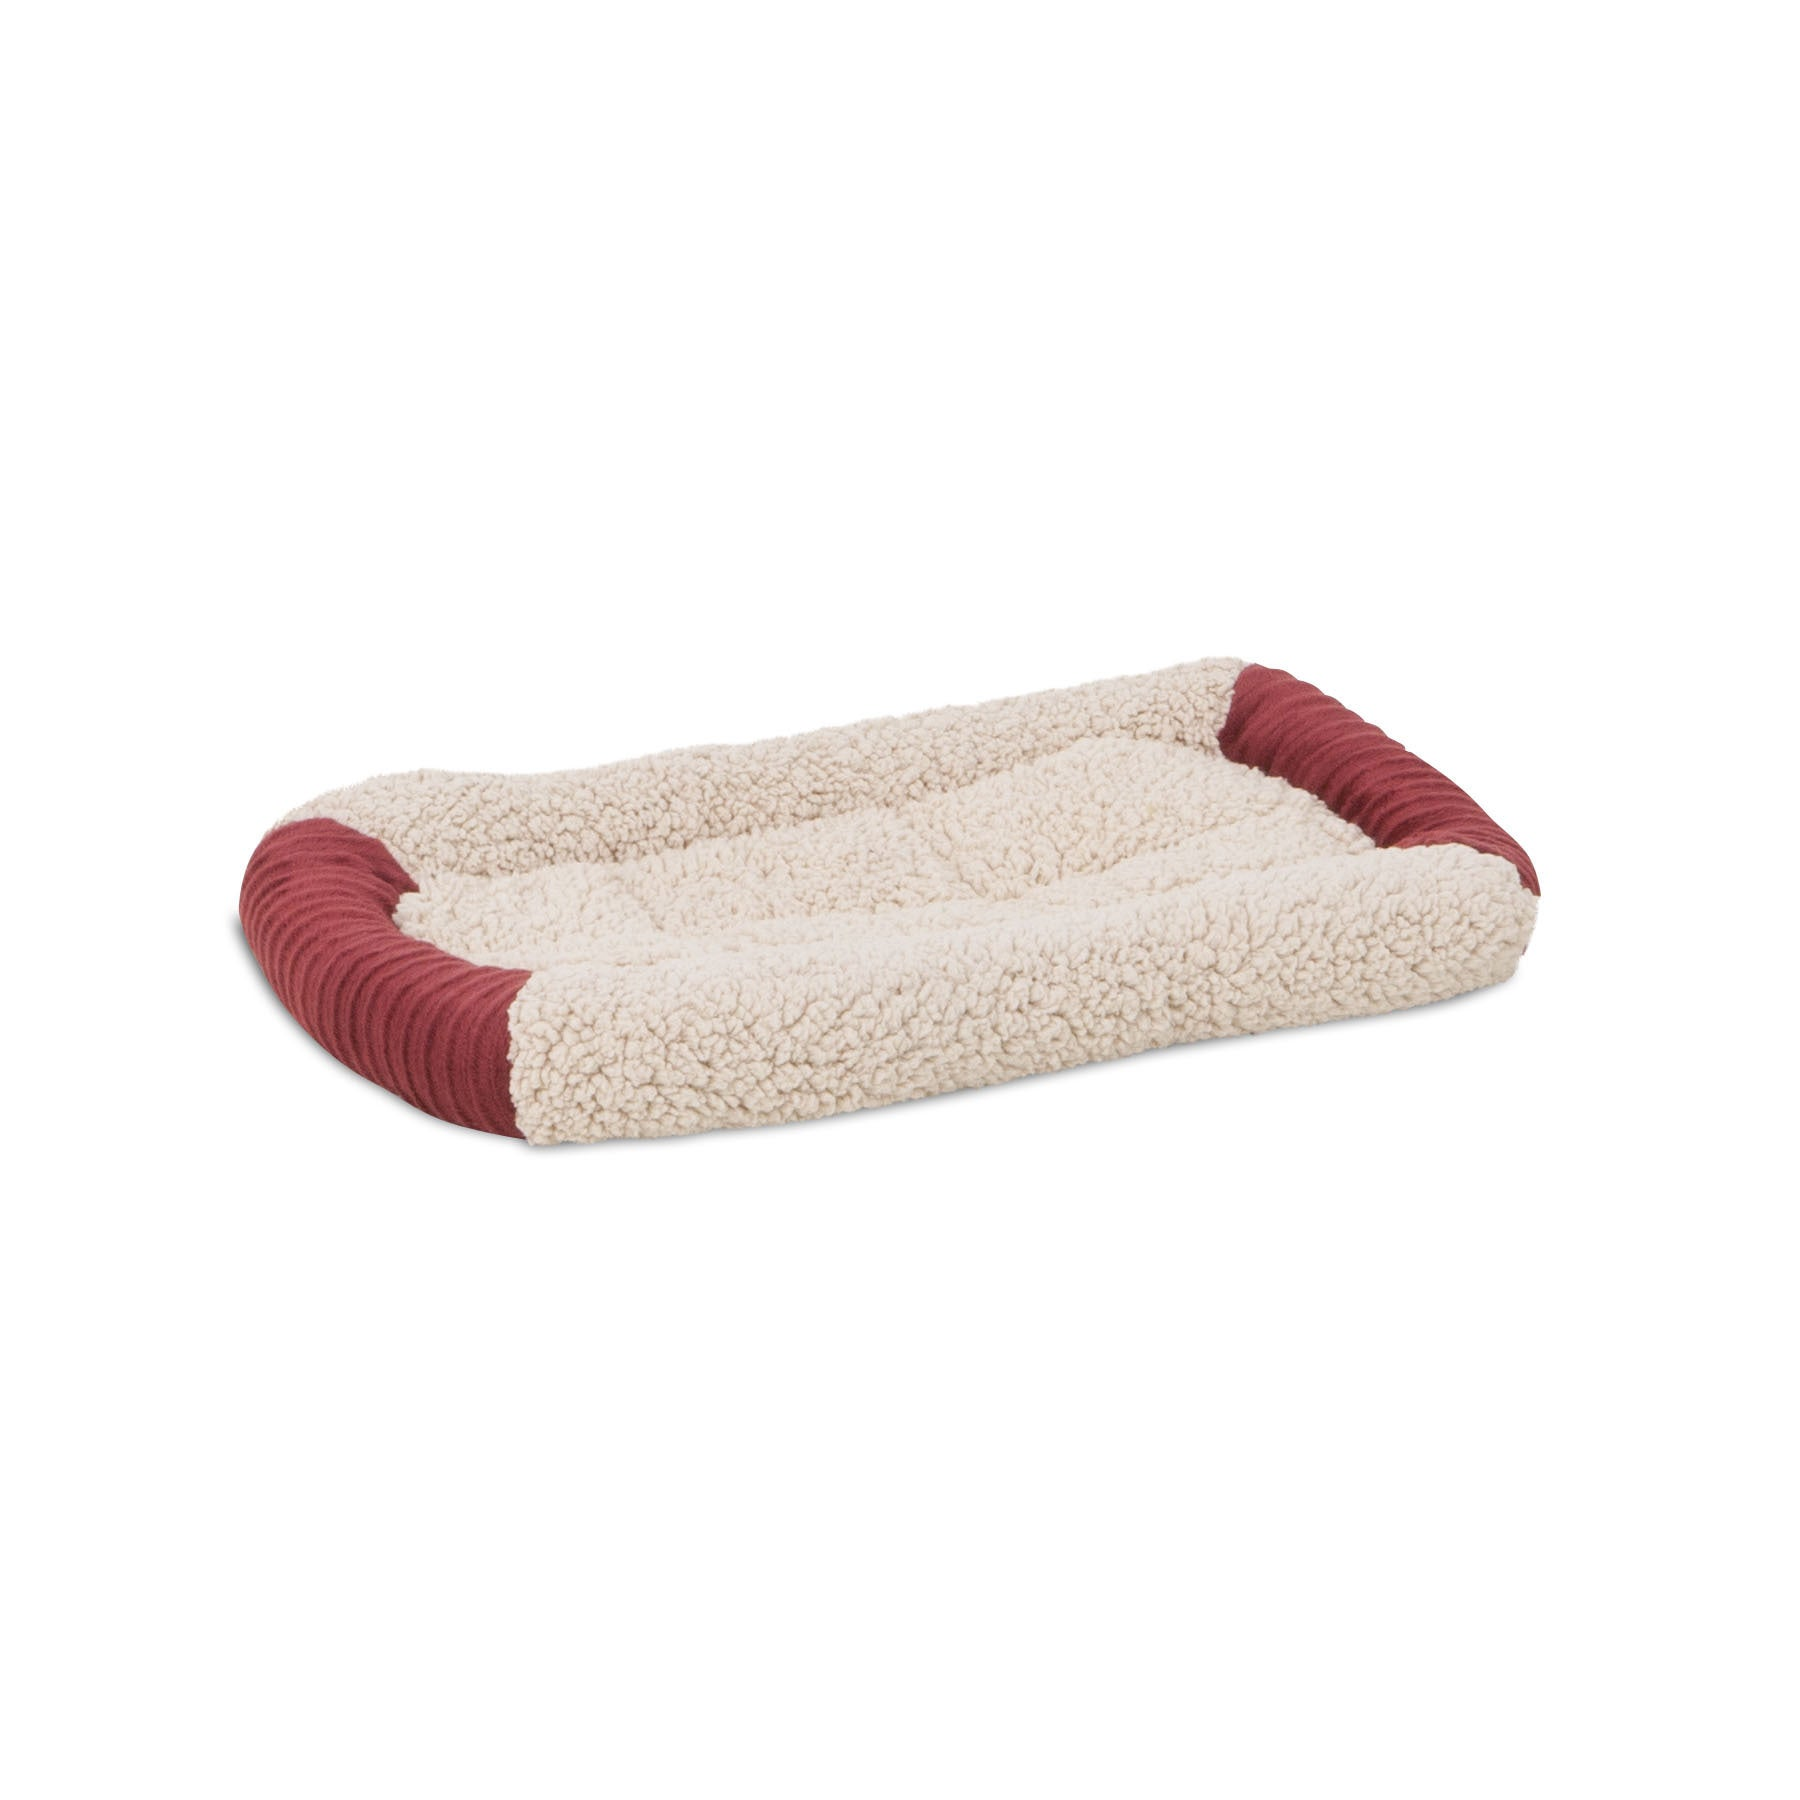 Aspen Pet Aspen Self-warming Bolster Dog Crate Bed (Large...